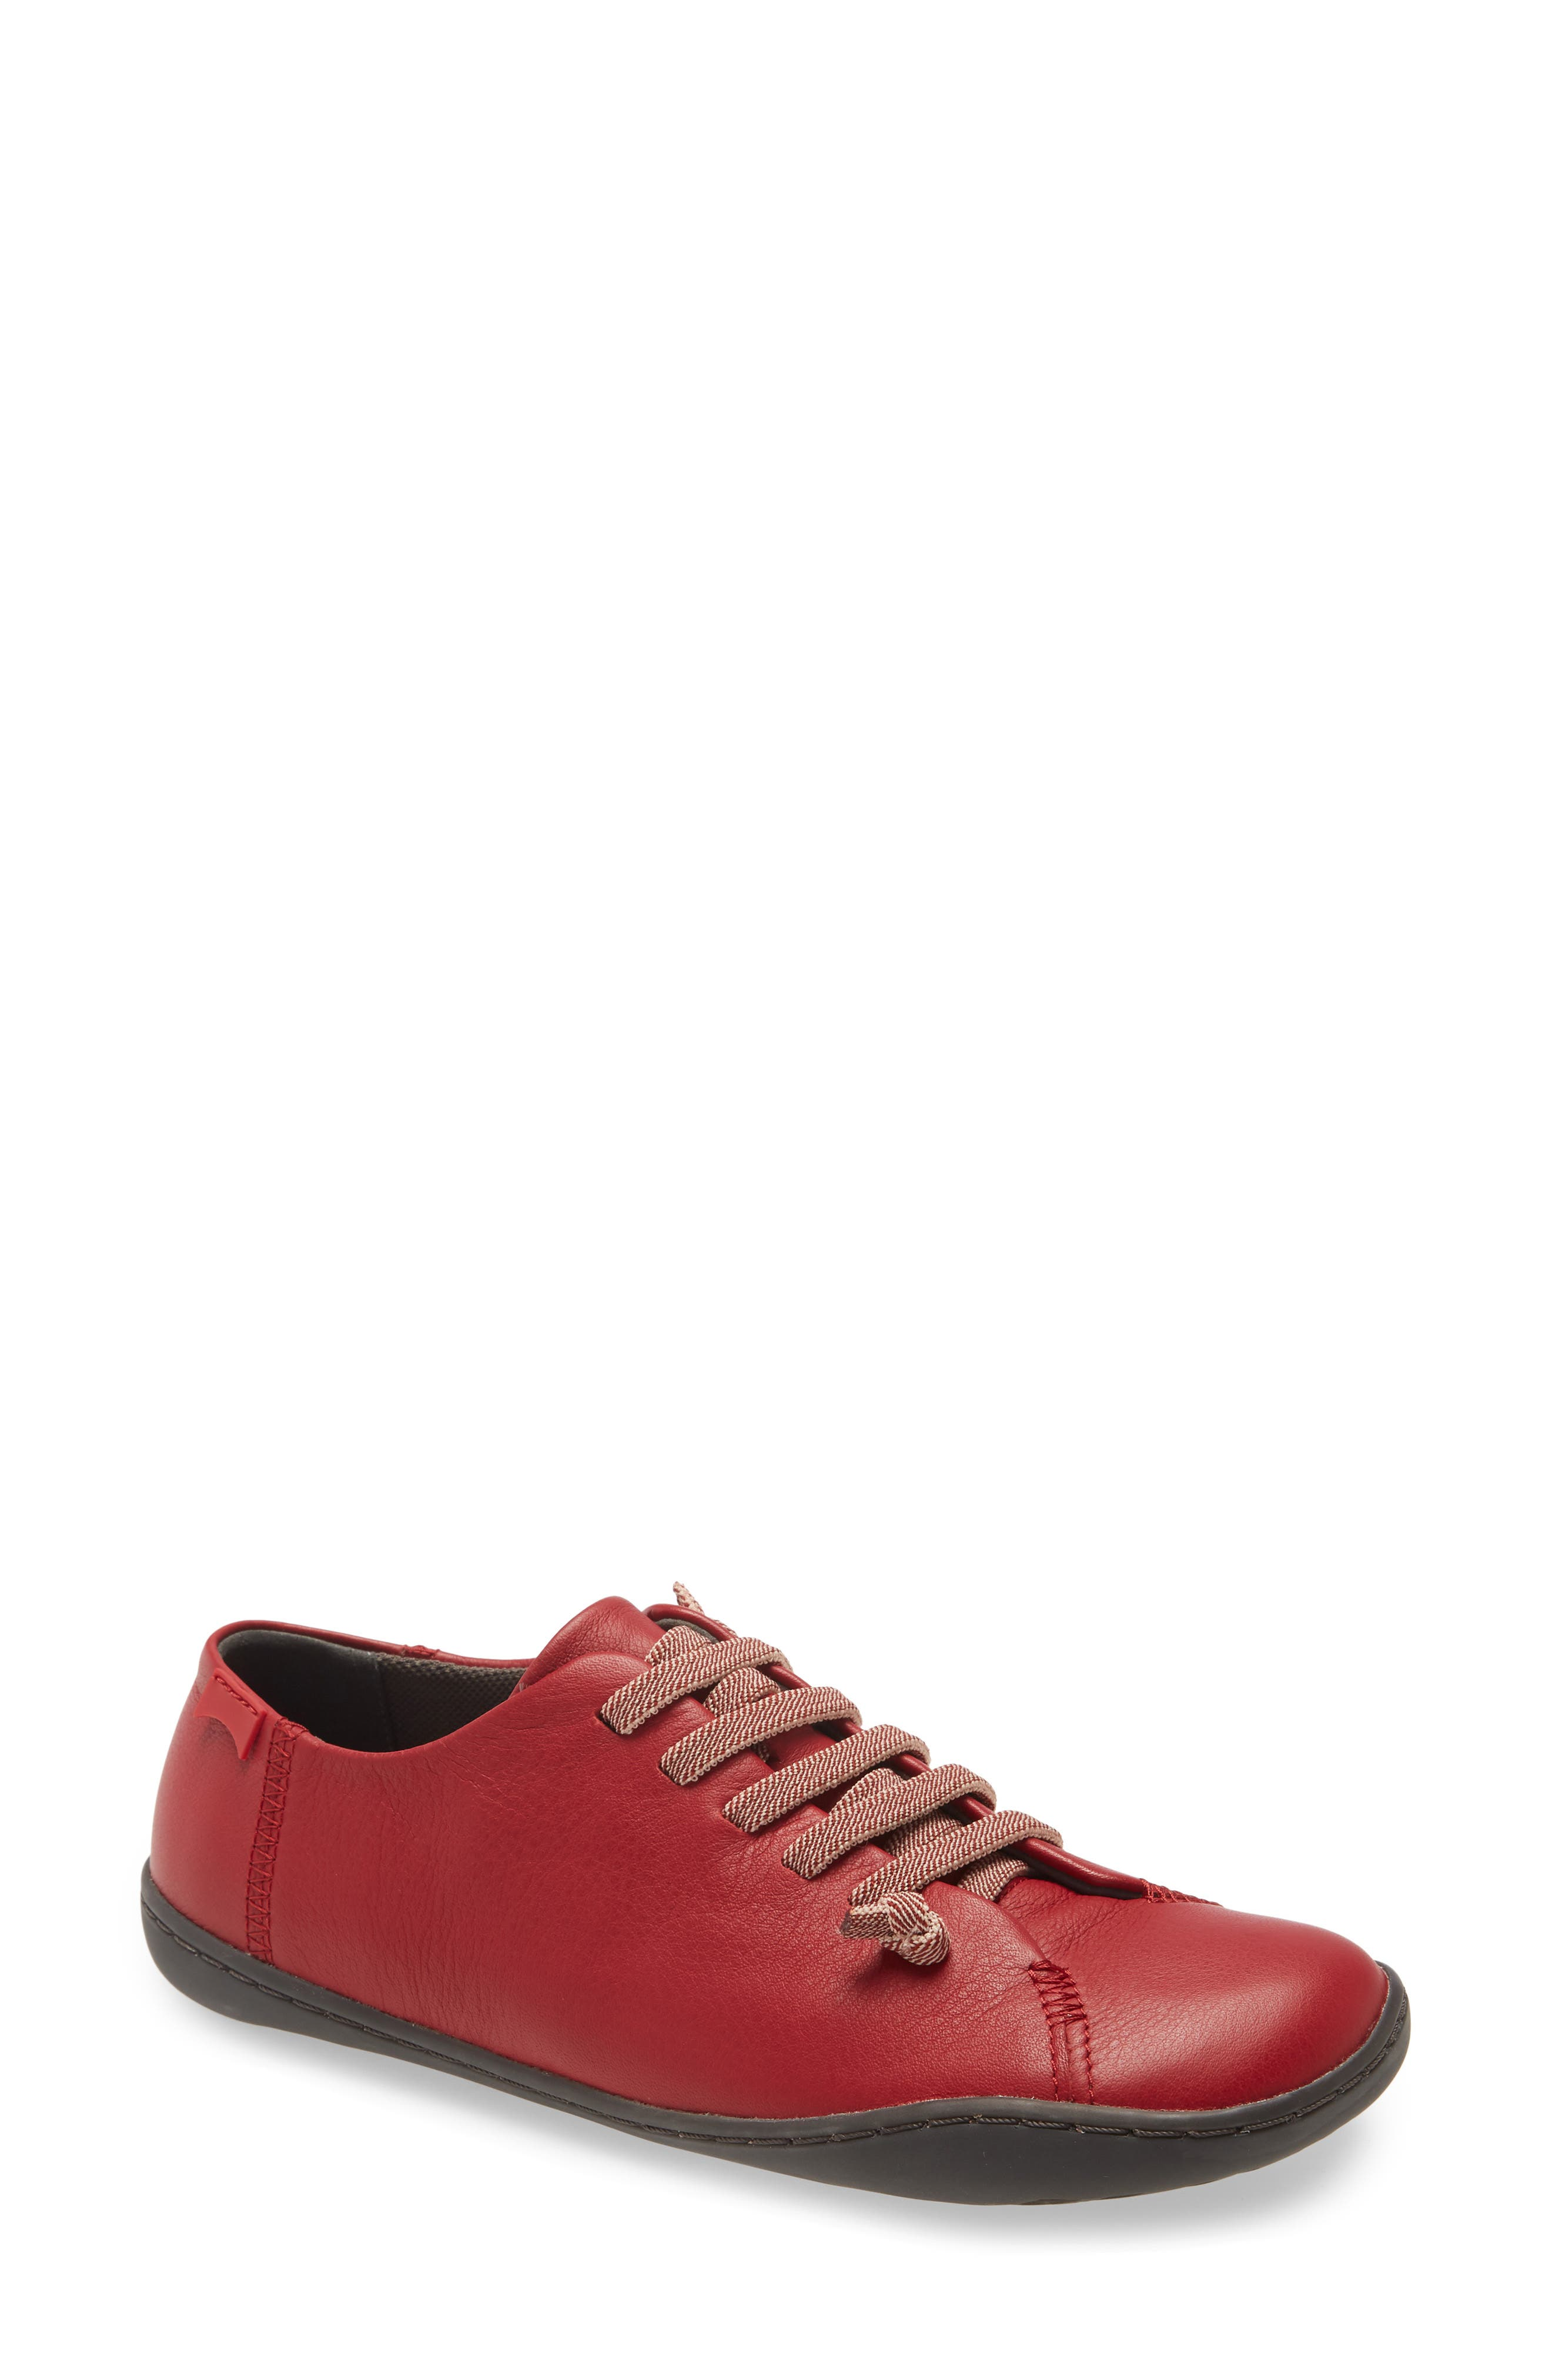 orthotic friendly women's dress shoes